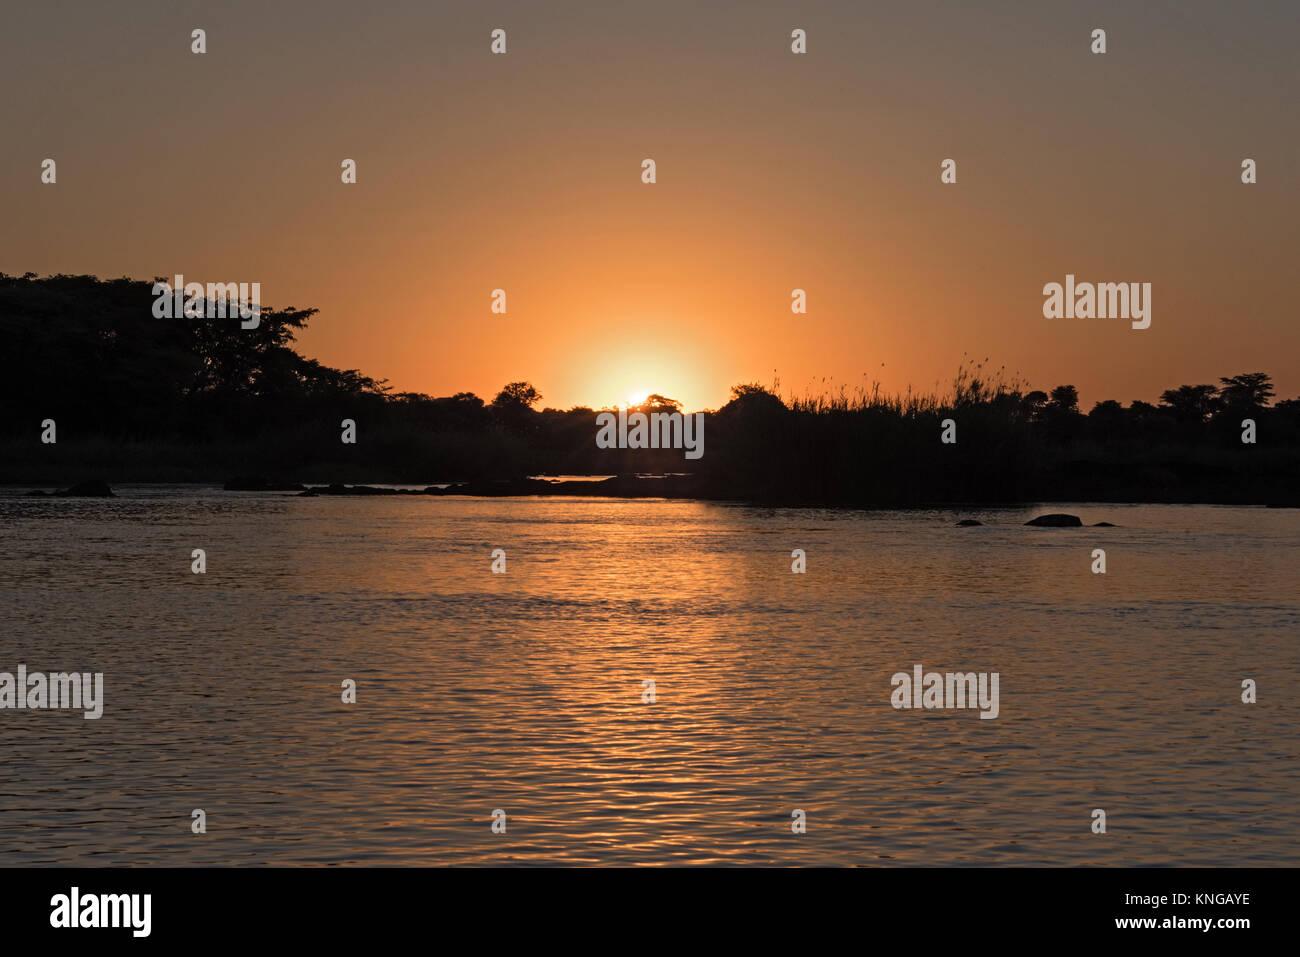 sunset on the okavango river in namibia - Stock Image